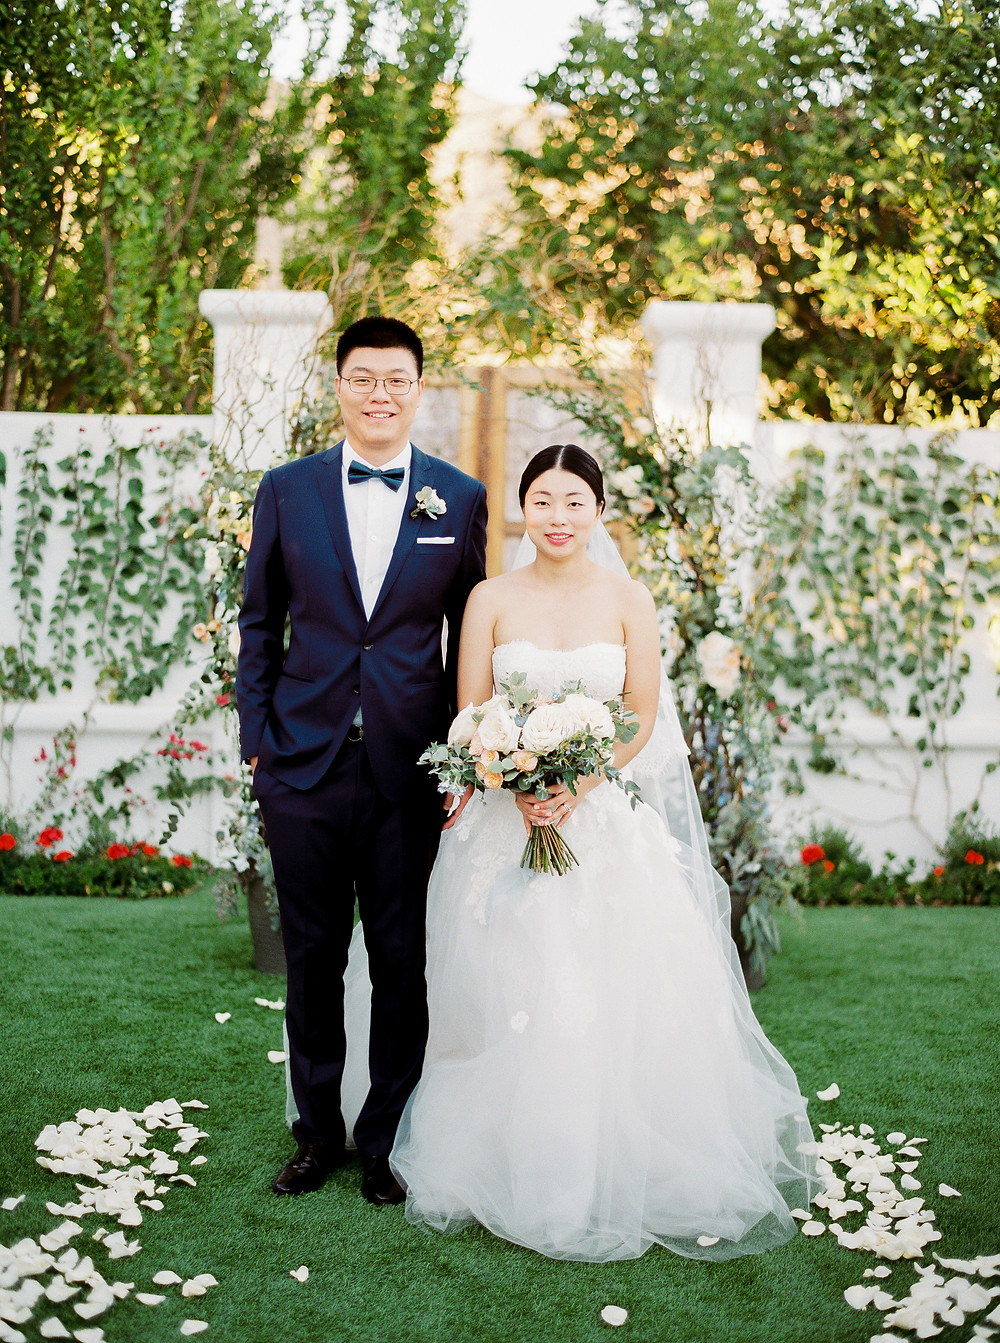 El Chorro Wedding, Traditional Chinese Wedding, Couple Portraits